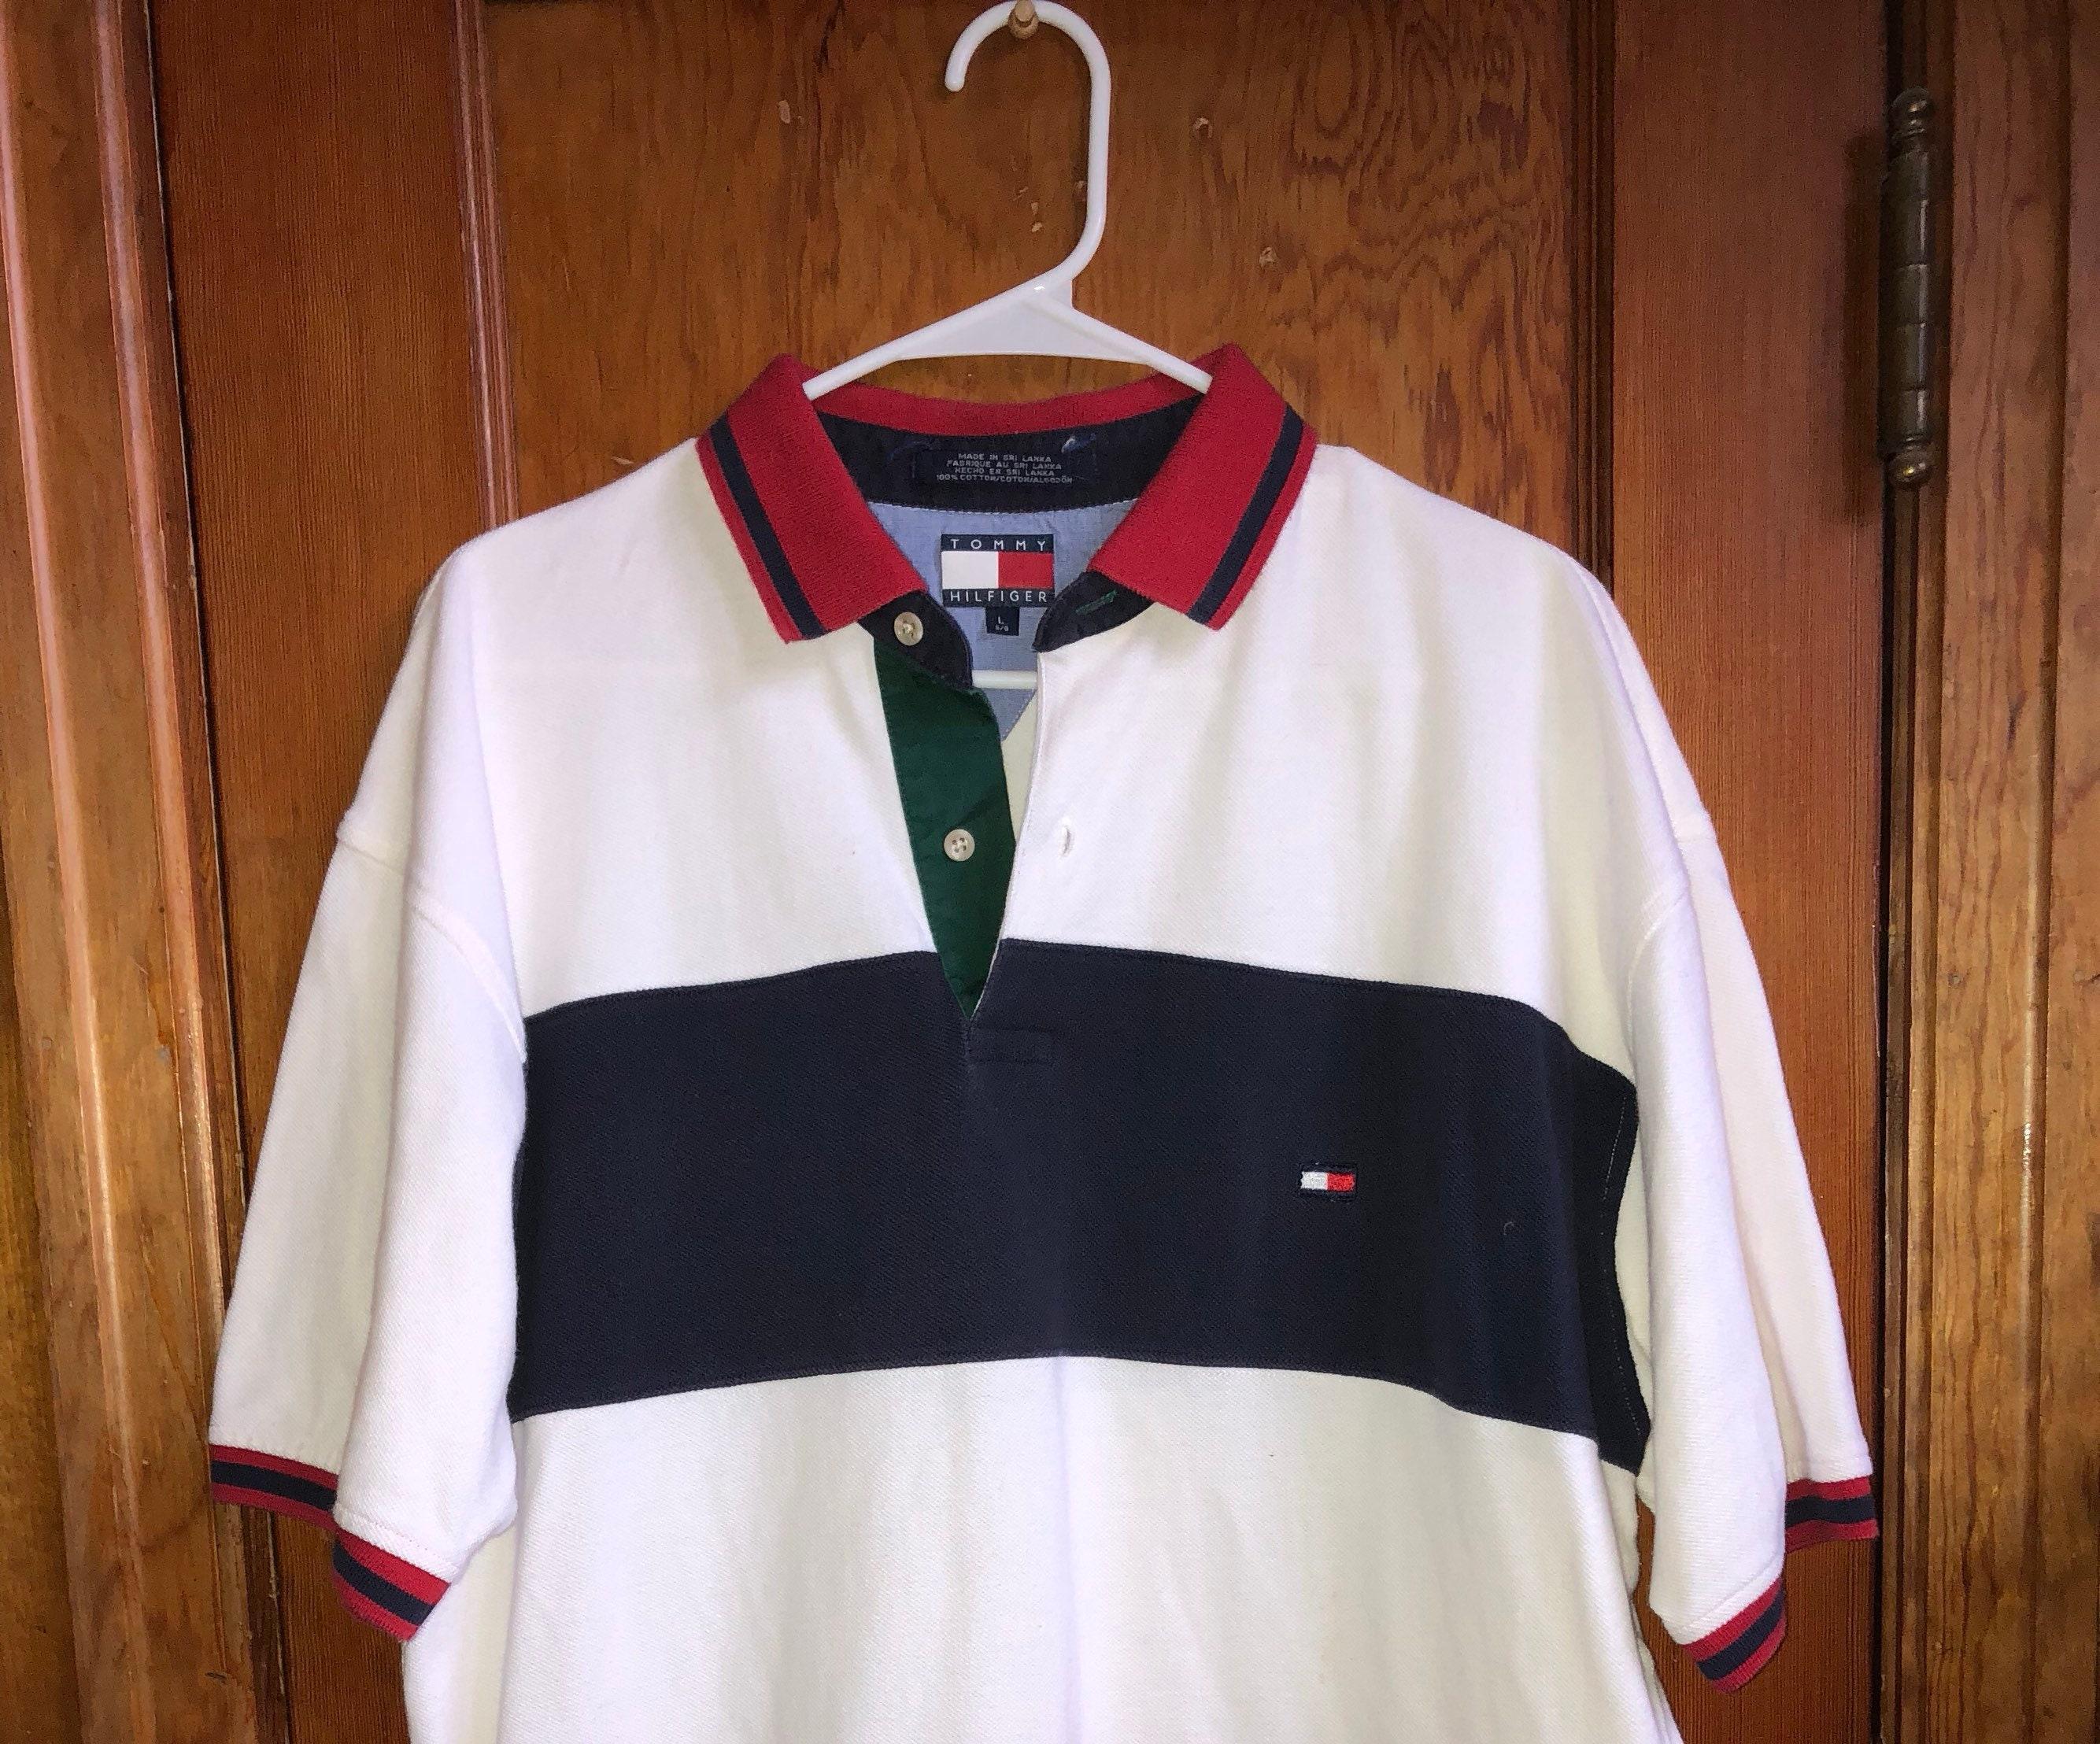 9db887a8 Vintage Tommy Hilfiger Striped Shirt Polo Size Large   Etsy